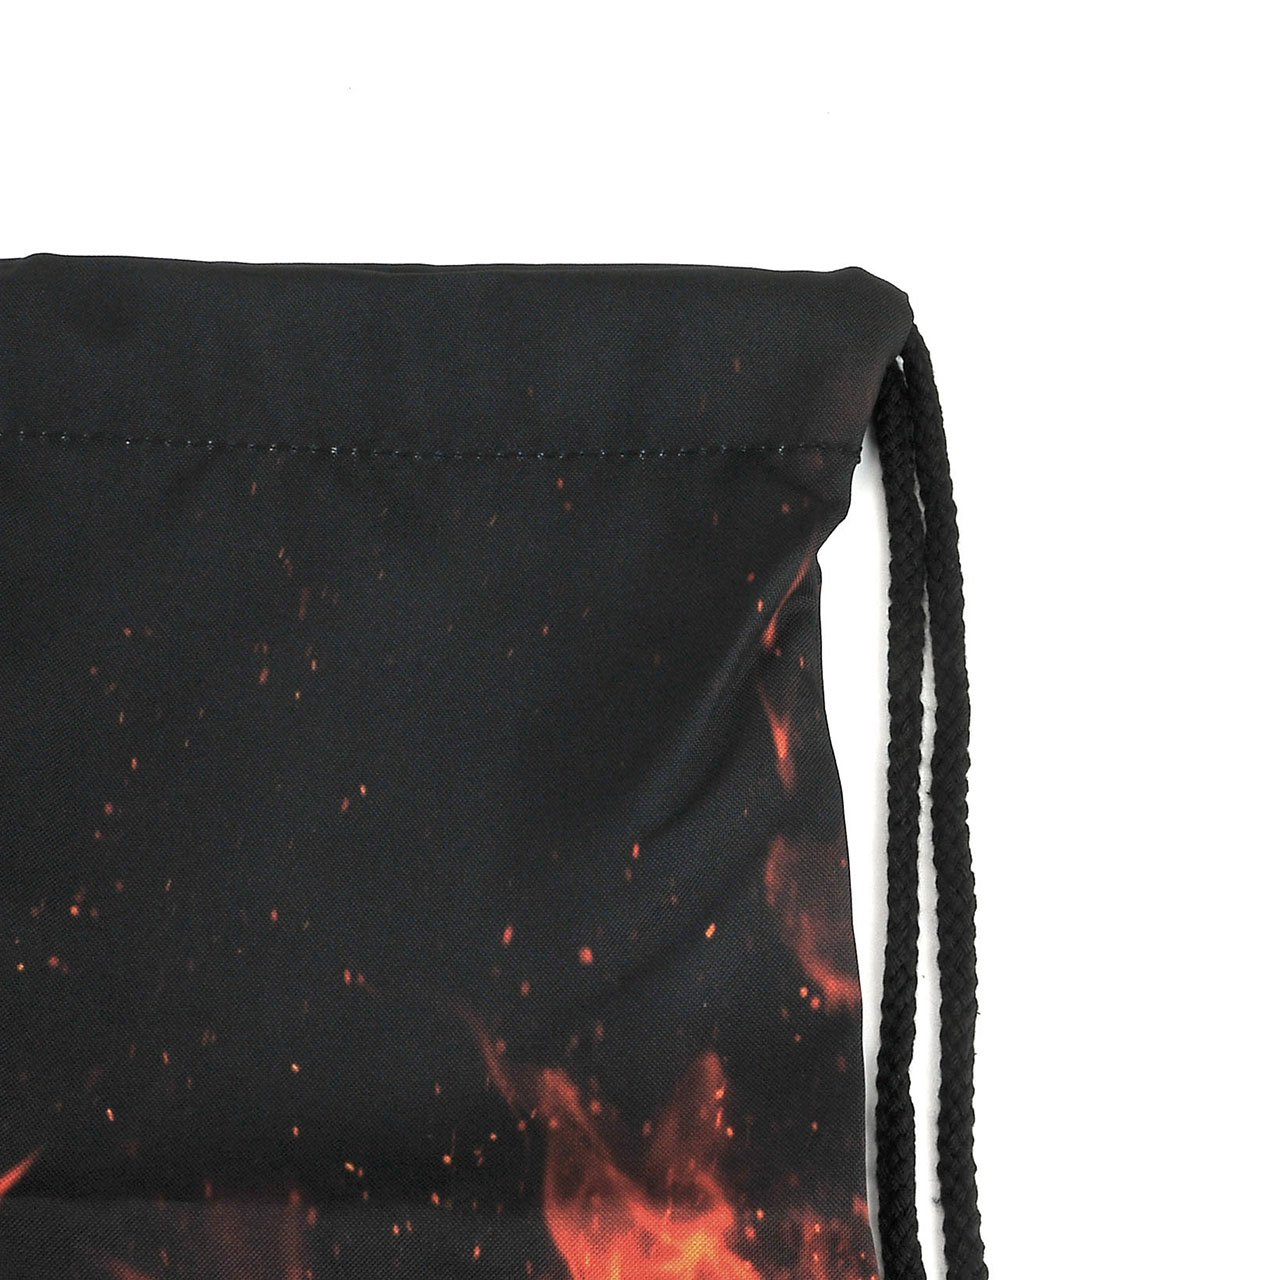 CHIC DIARY Hipster Segeltuch Rucksack Gym Sack Turnbeutel Beutel Sportbeute 3D Aufdruck Jutebeutel Muster Stringbags Tasche Bag